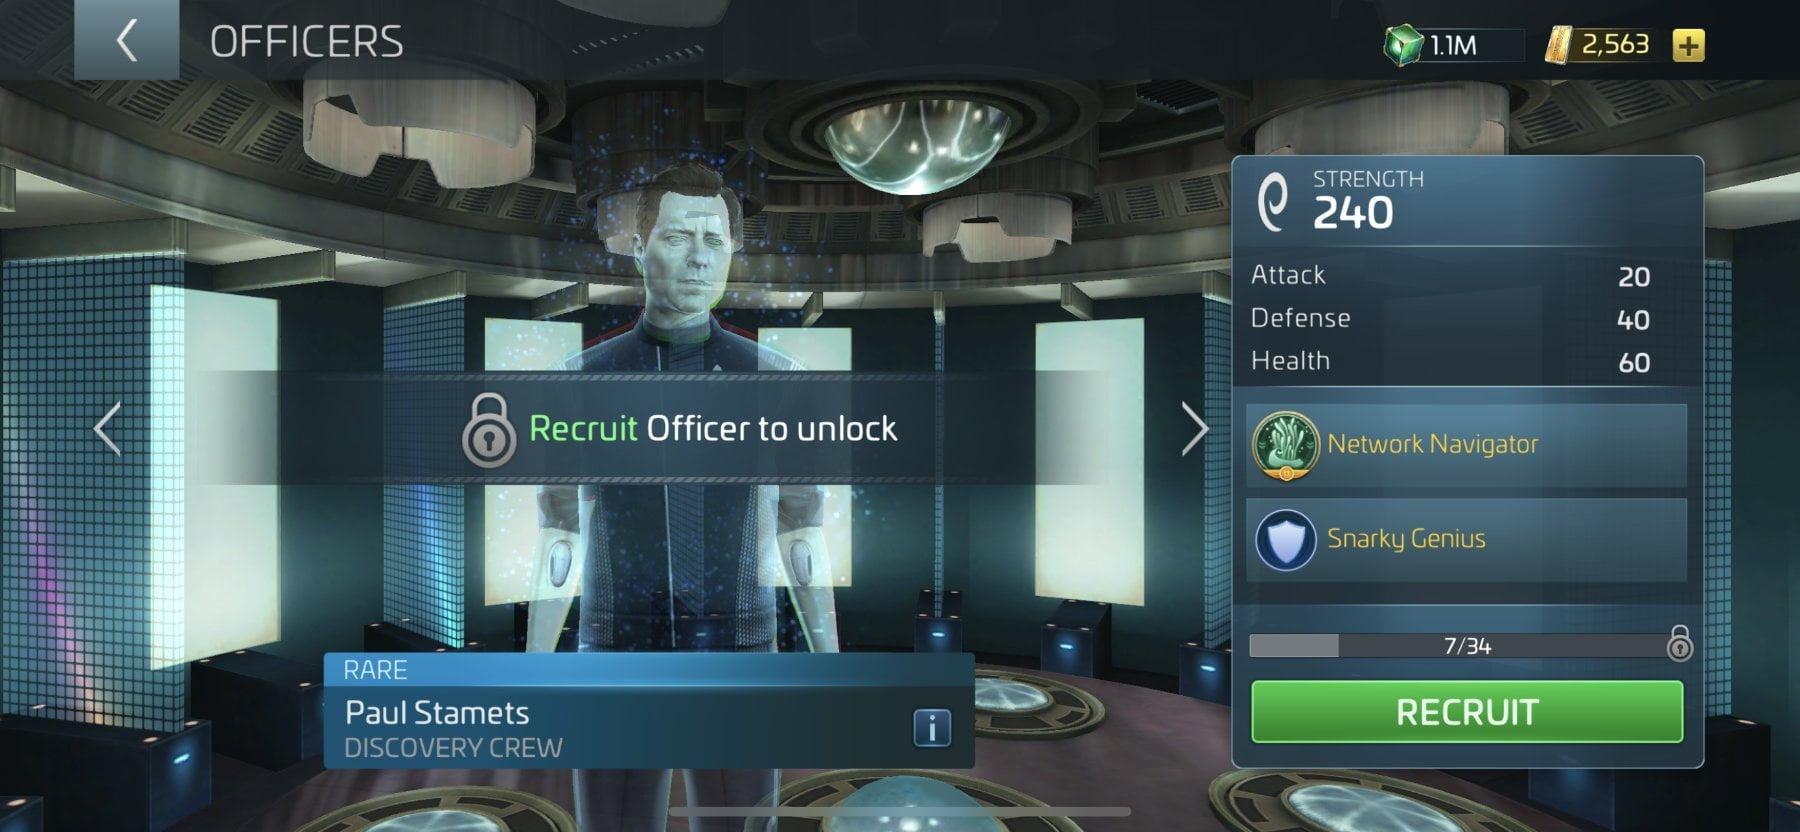 Star Trek Fleet Command Officer Paul Stamets